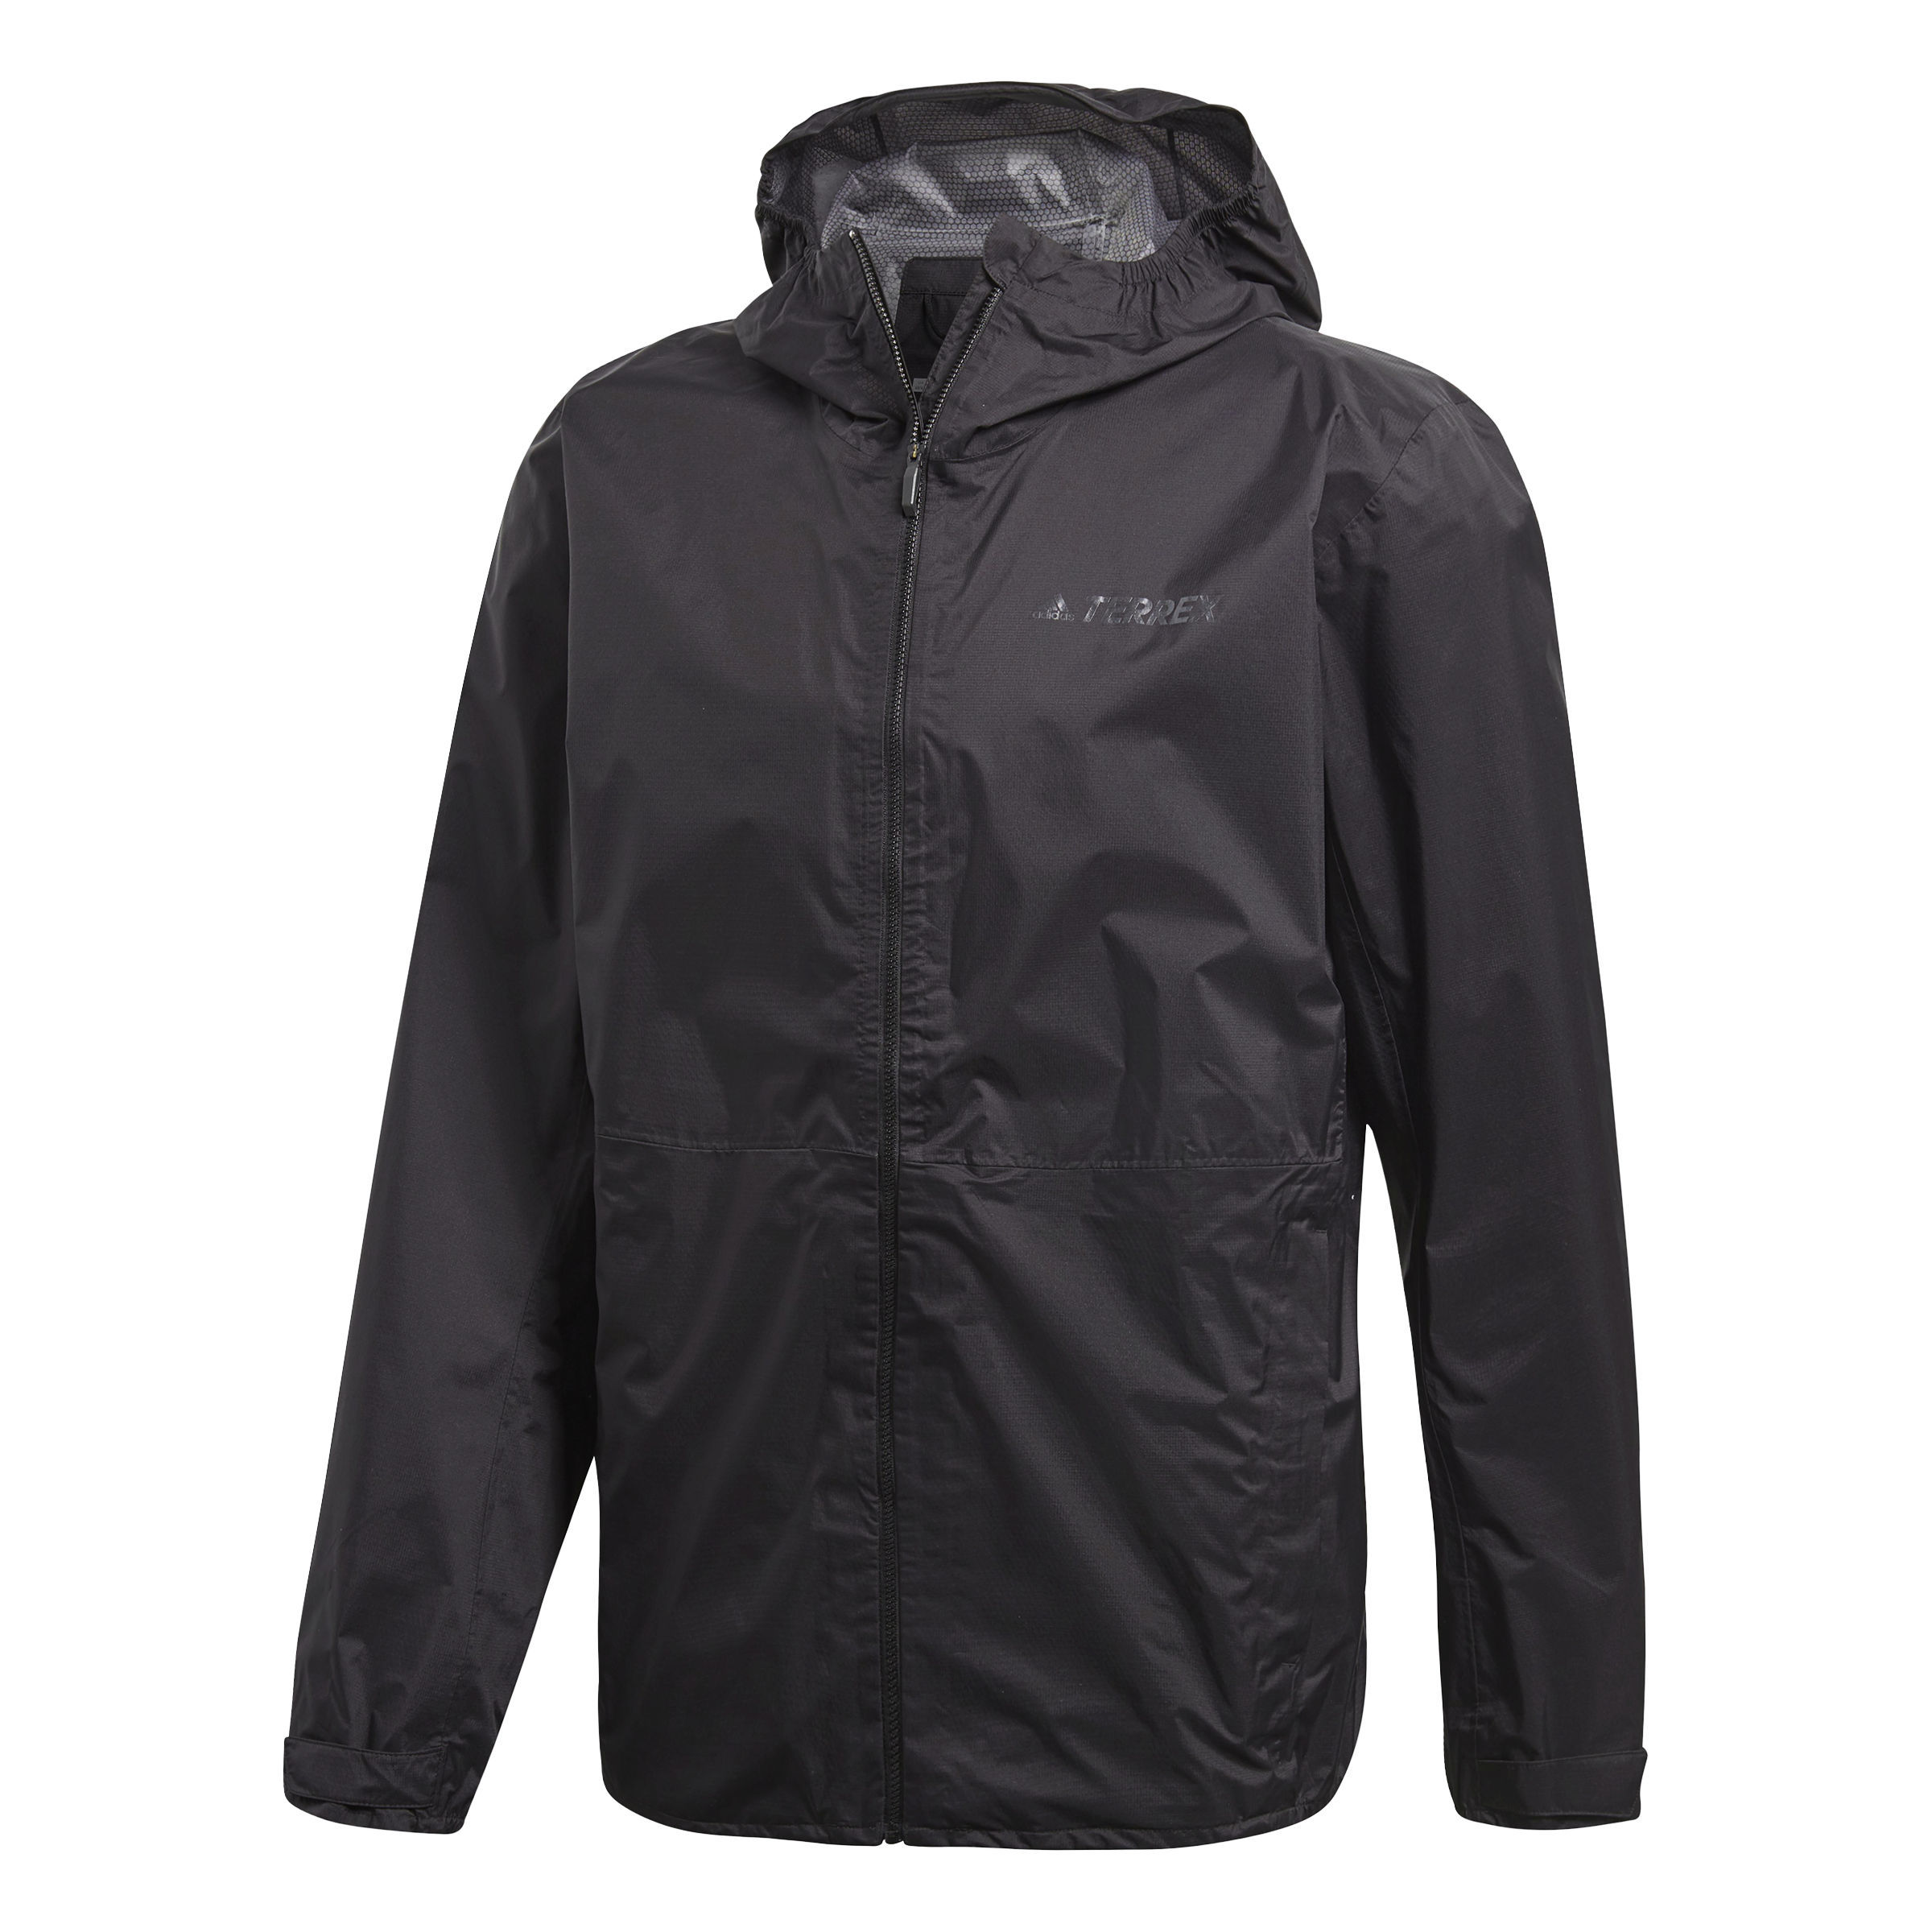 Adidas Outdoor Fastpack 2.5L Ultralight Rain Jacket Men's